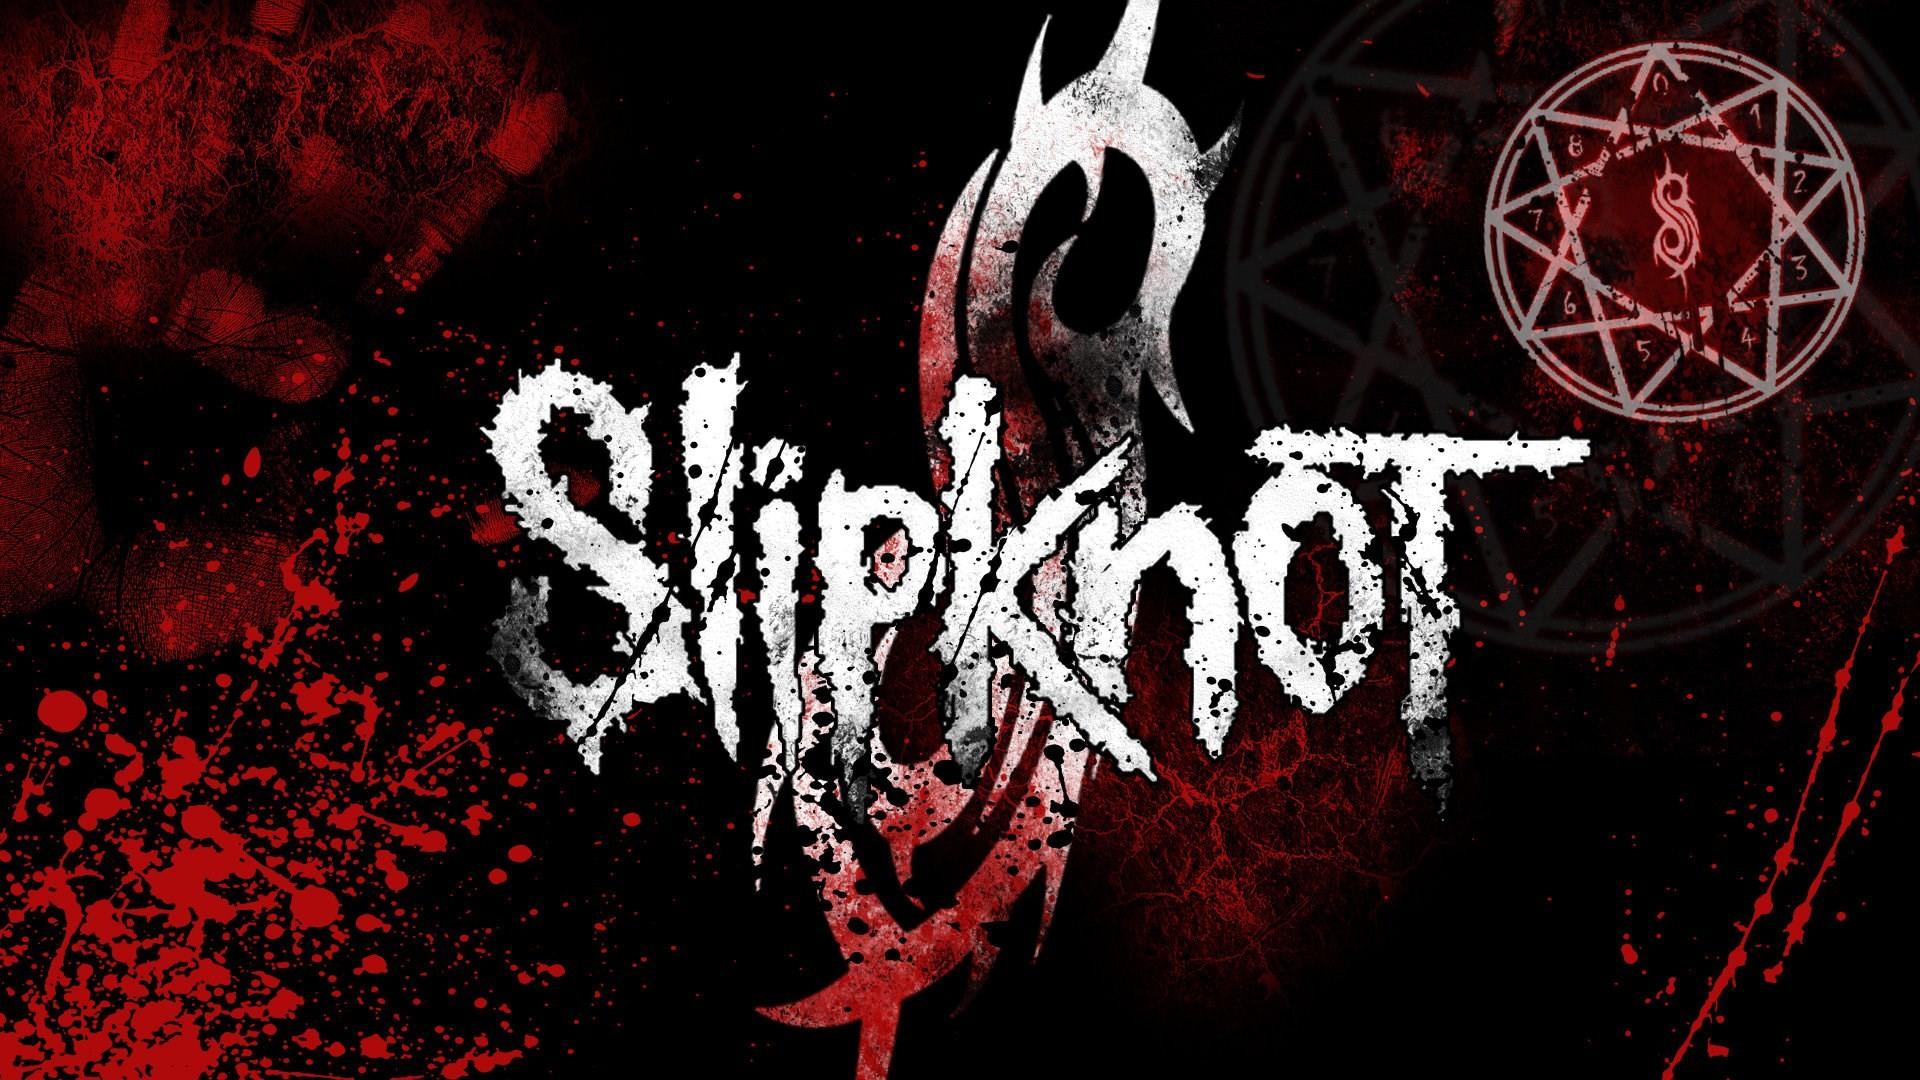 Slipknot wallpaper 2018 1920x1080 slipknot wallpapers voltagebd Image collections